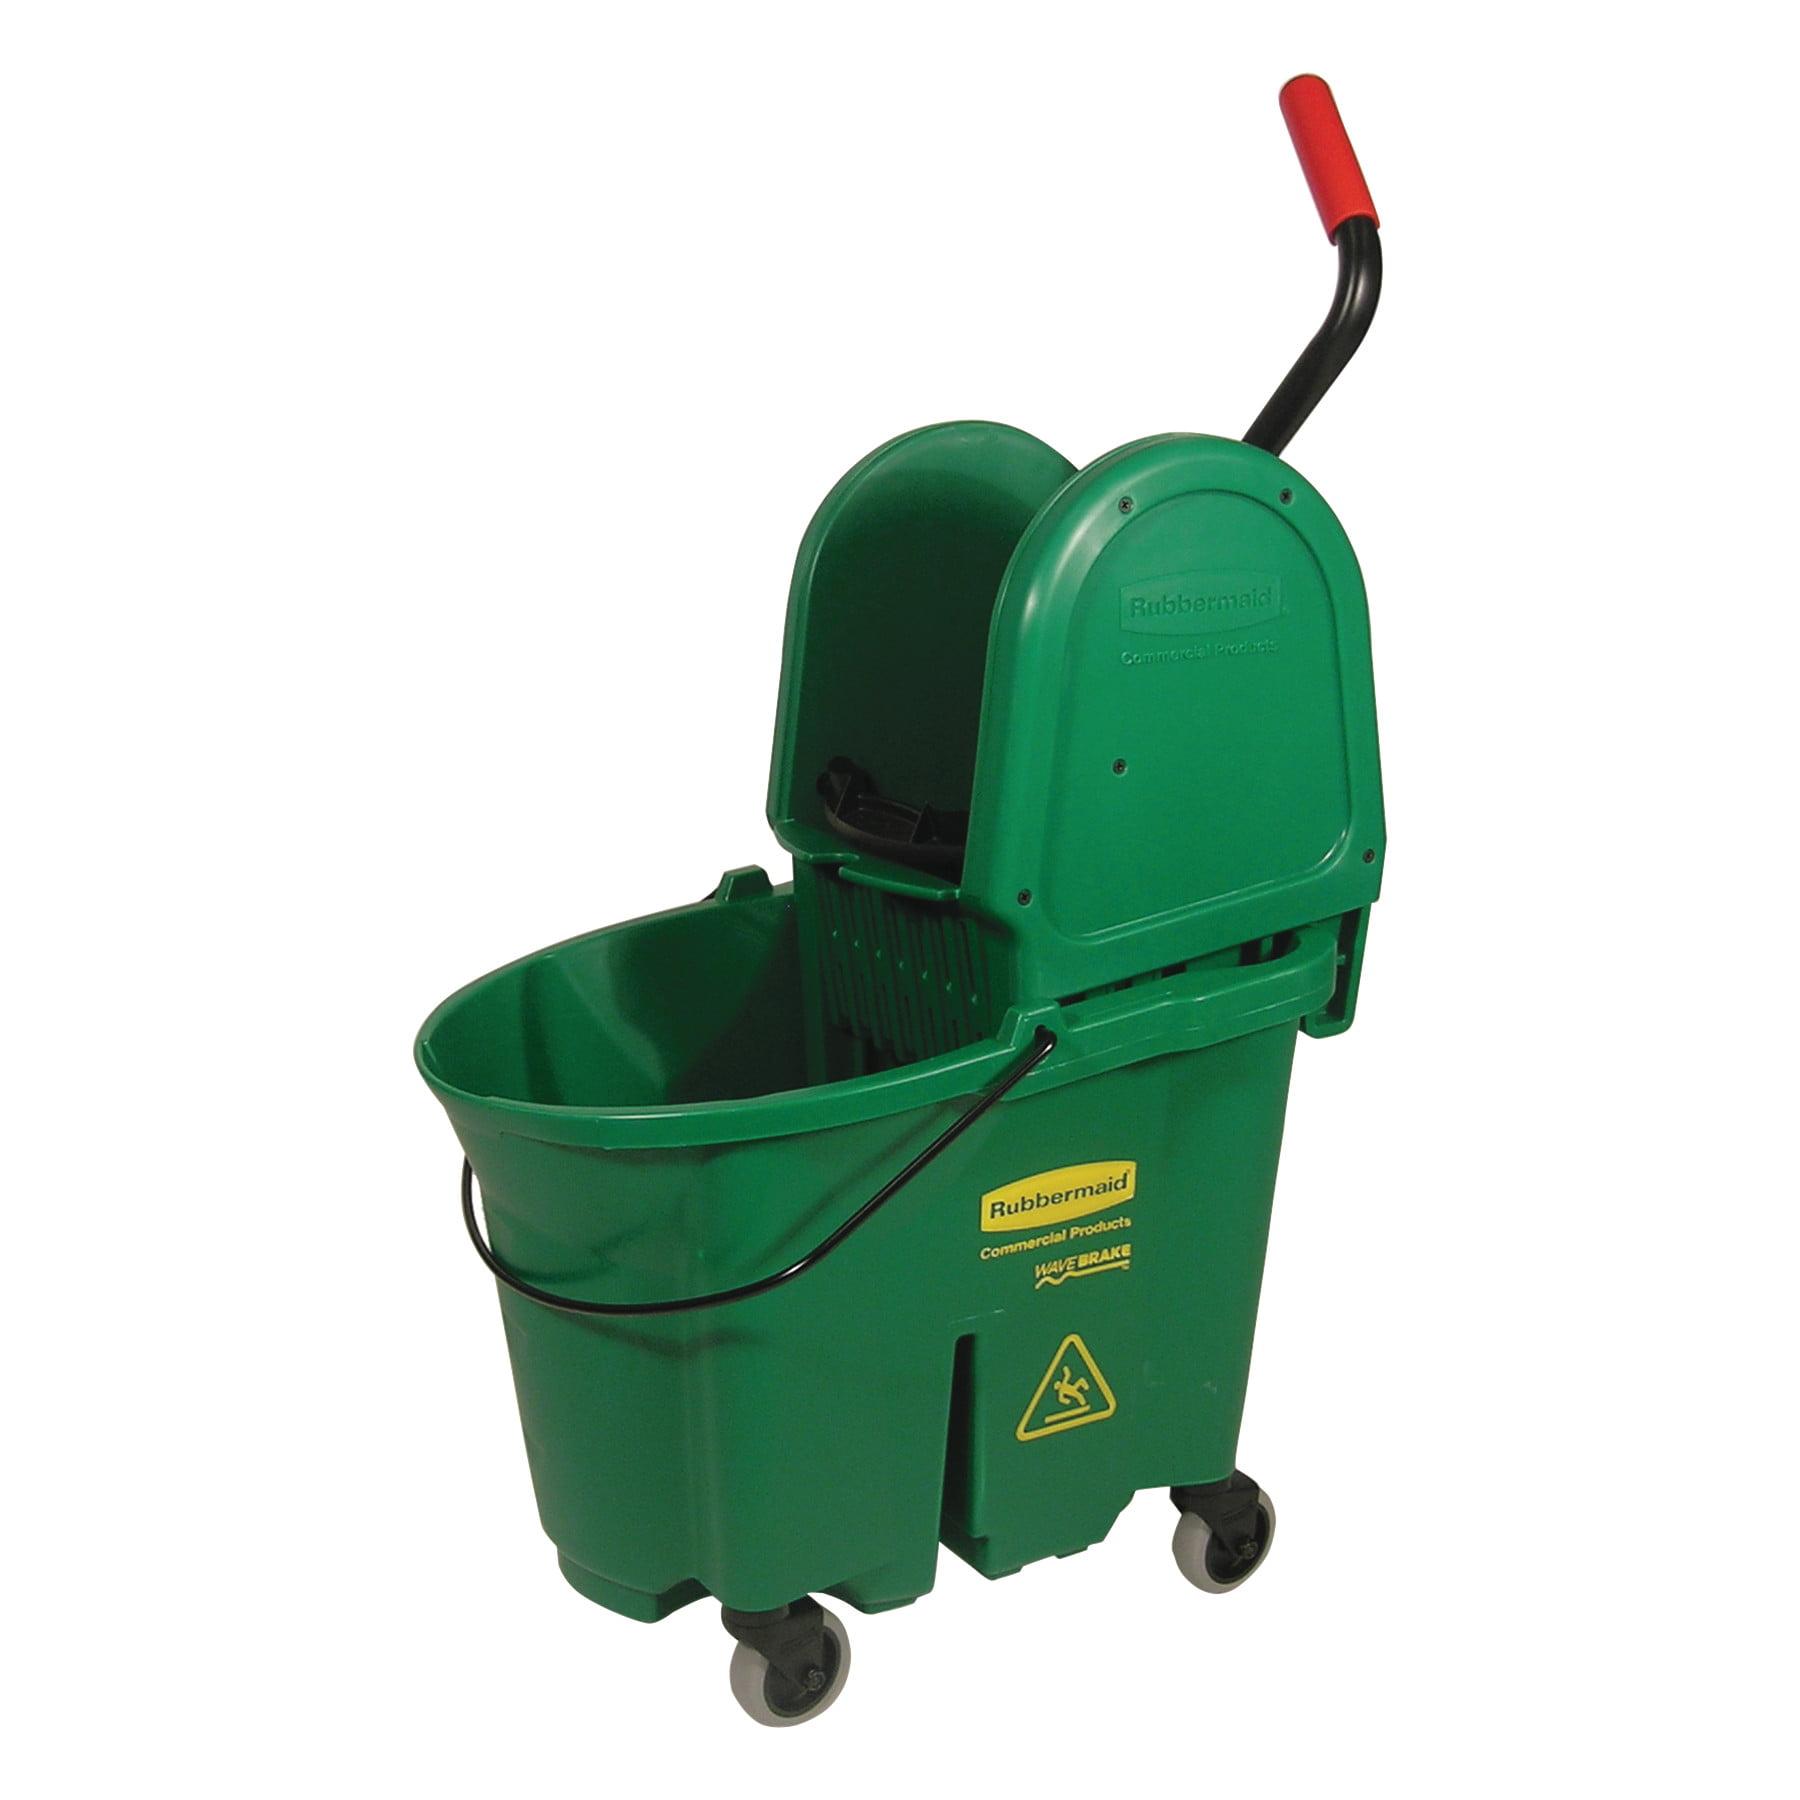 Rubbermaid Commercial WaveBrake Bucket/Wringer Combos, 35 qt, Green